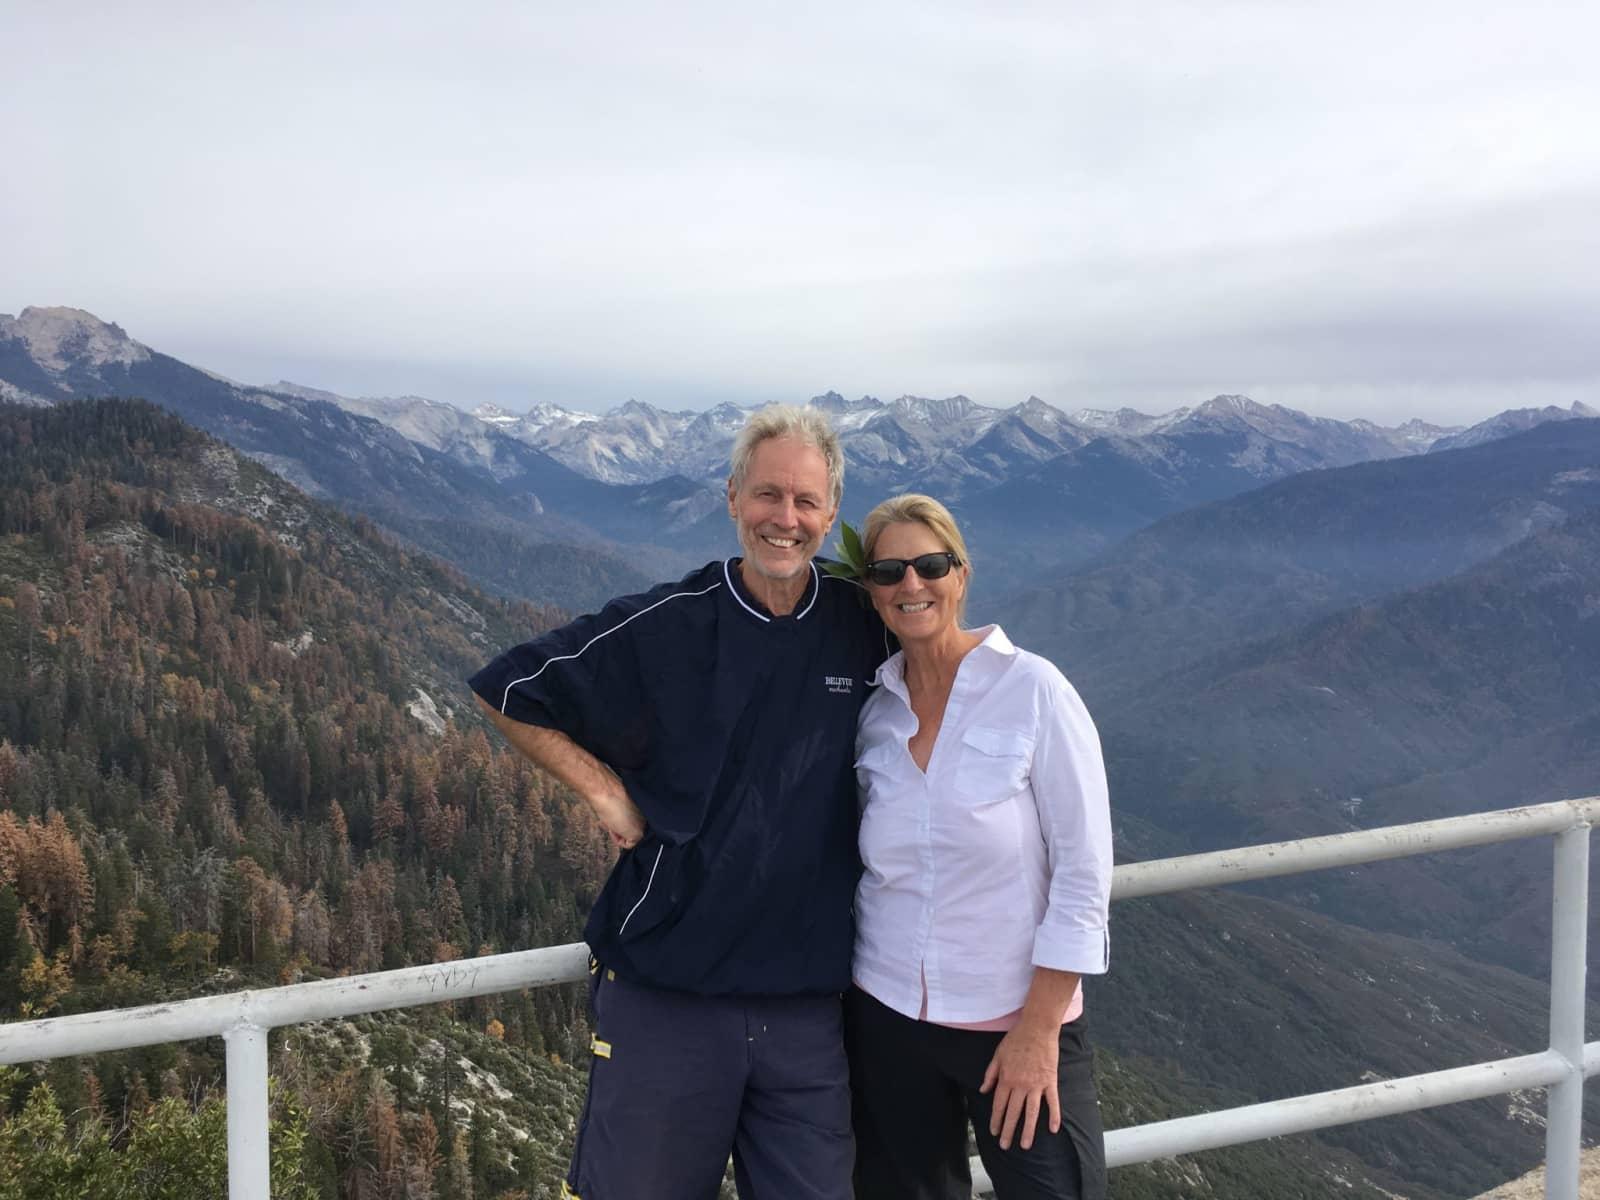 Carol & David from Issaquah, Washington, United States